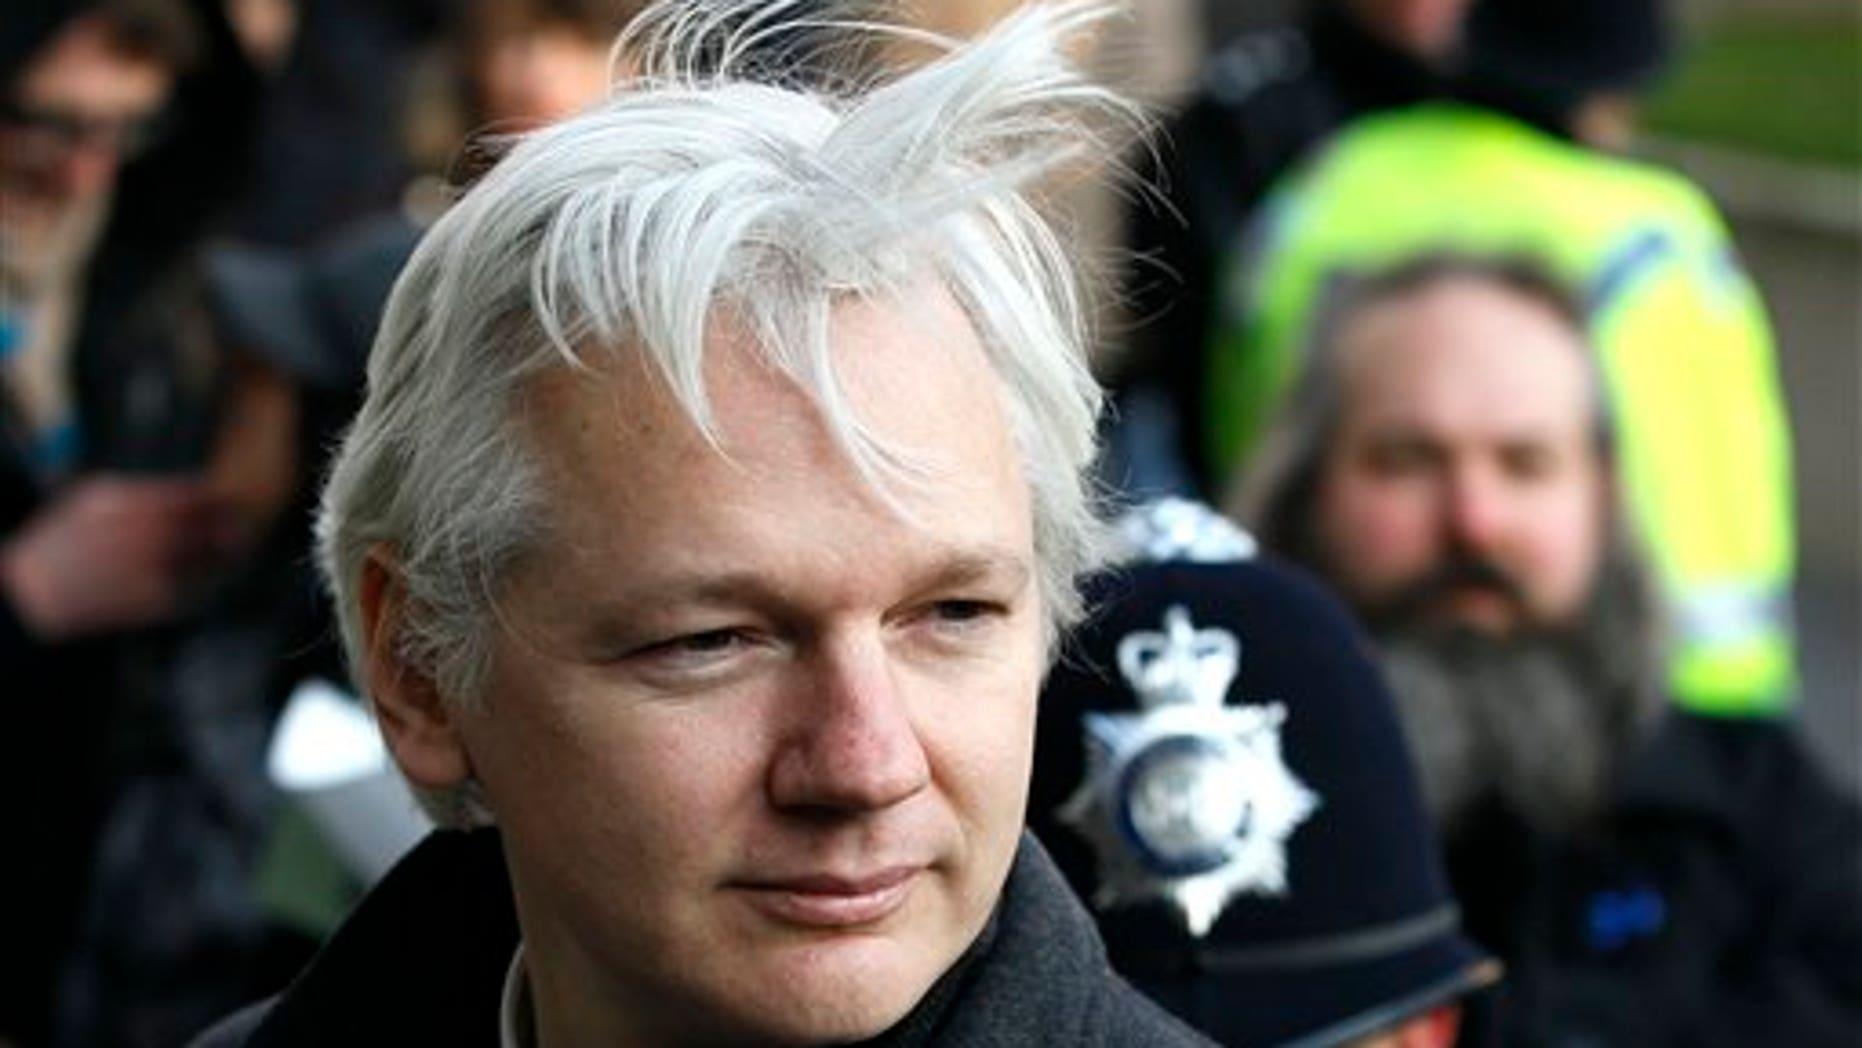 June 2012: Julian Assange, founder of Wikileaks, recently sought asylum inside Ecuador's London embassy.